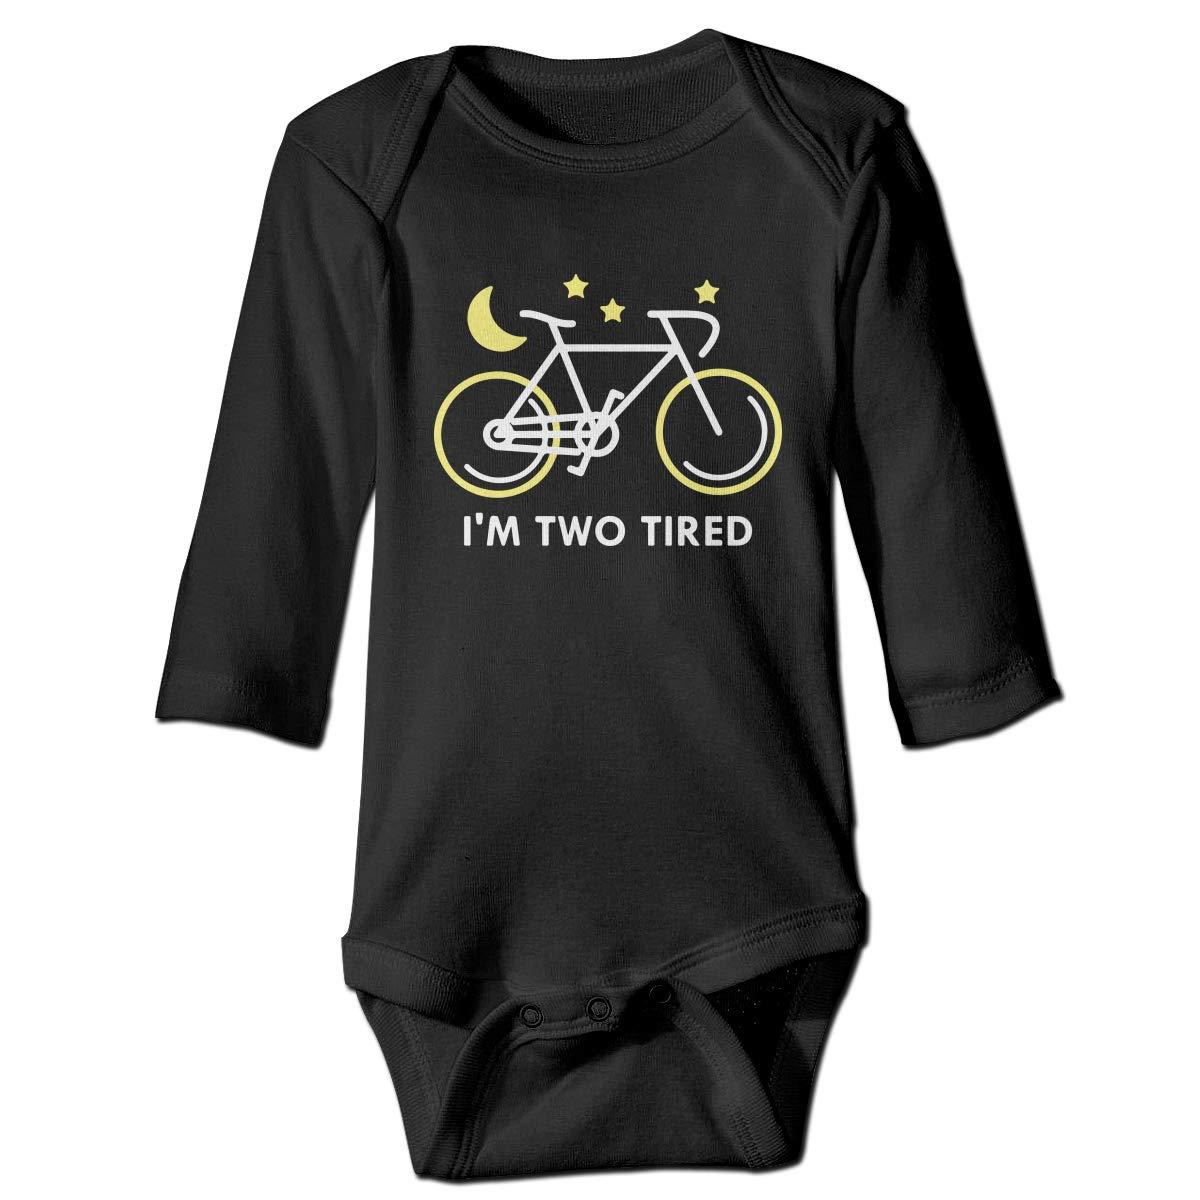 CZDedgQ99 Toddler Im Two Tired Long Sleeve Climbing Clothes Pajamas Sleepwear Suit 6-24 Months